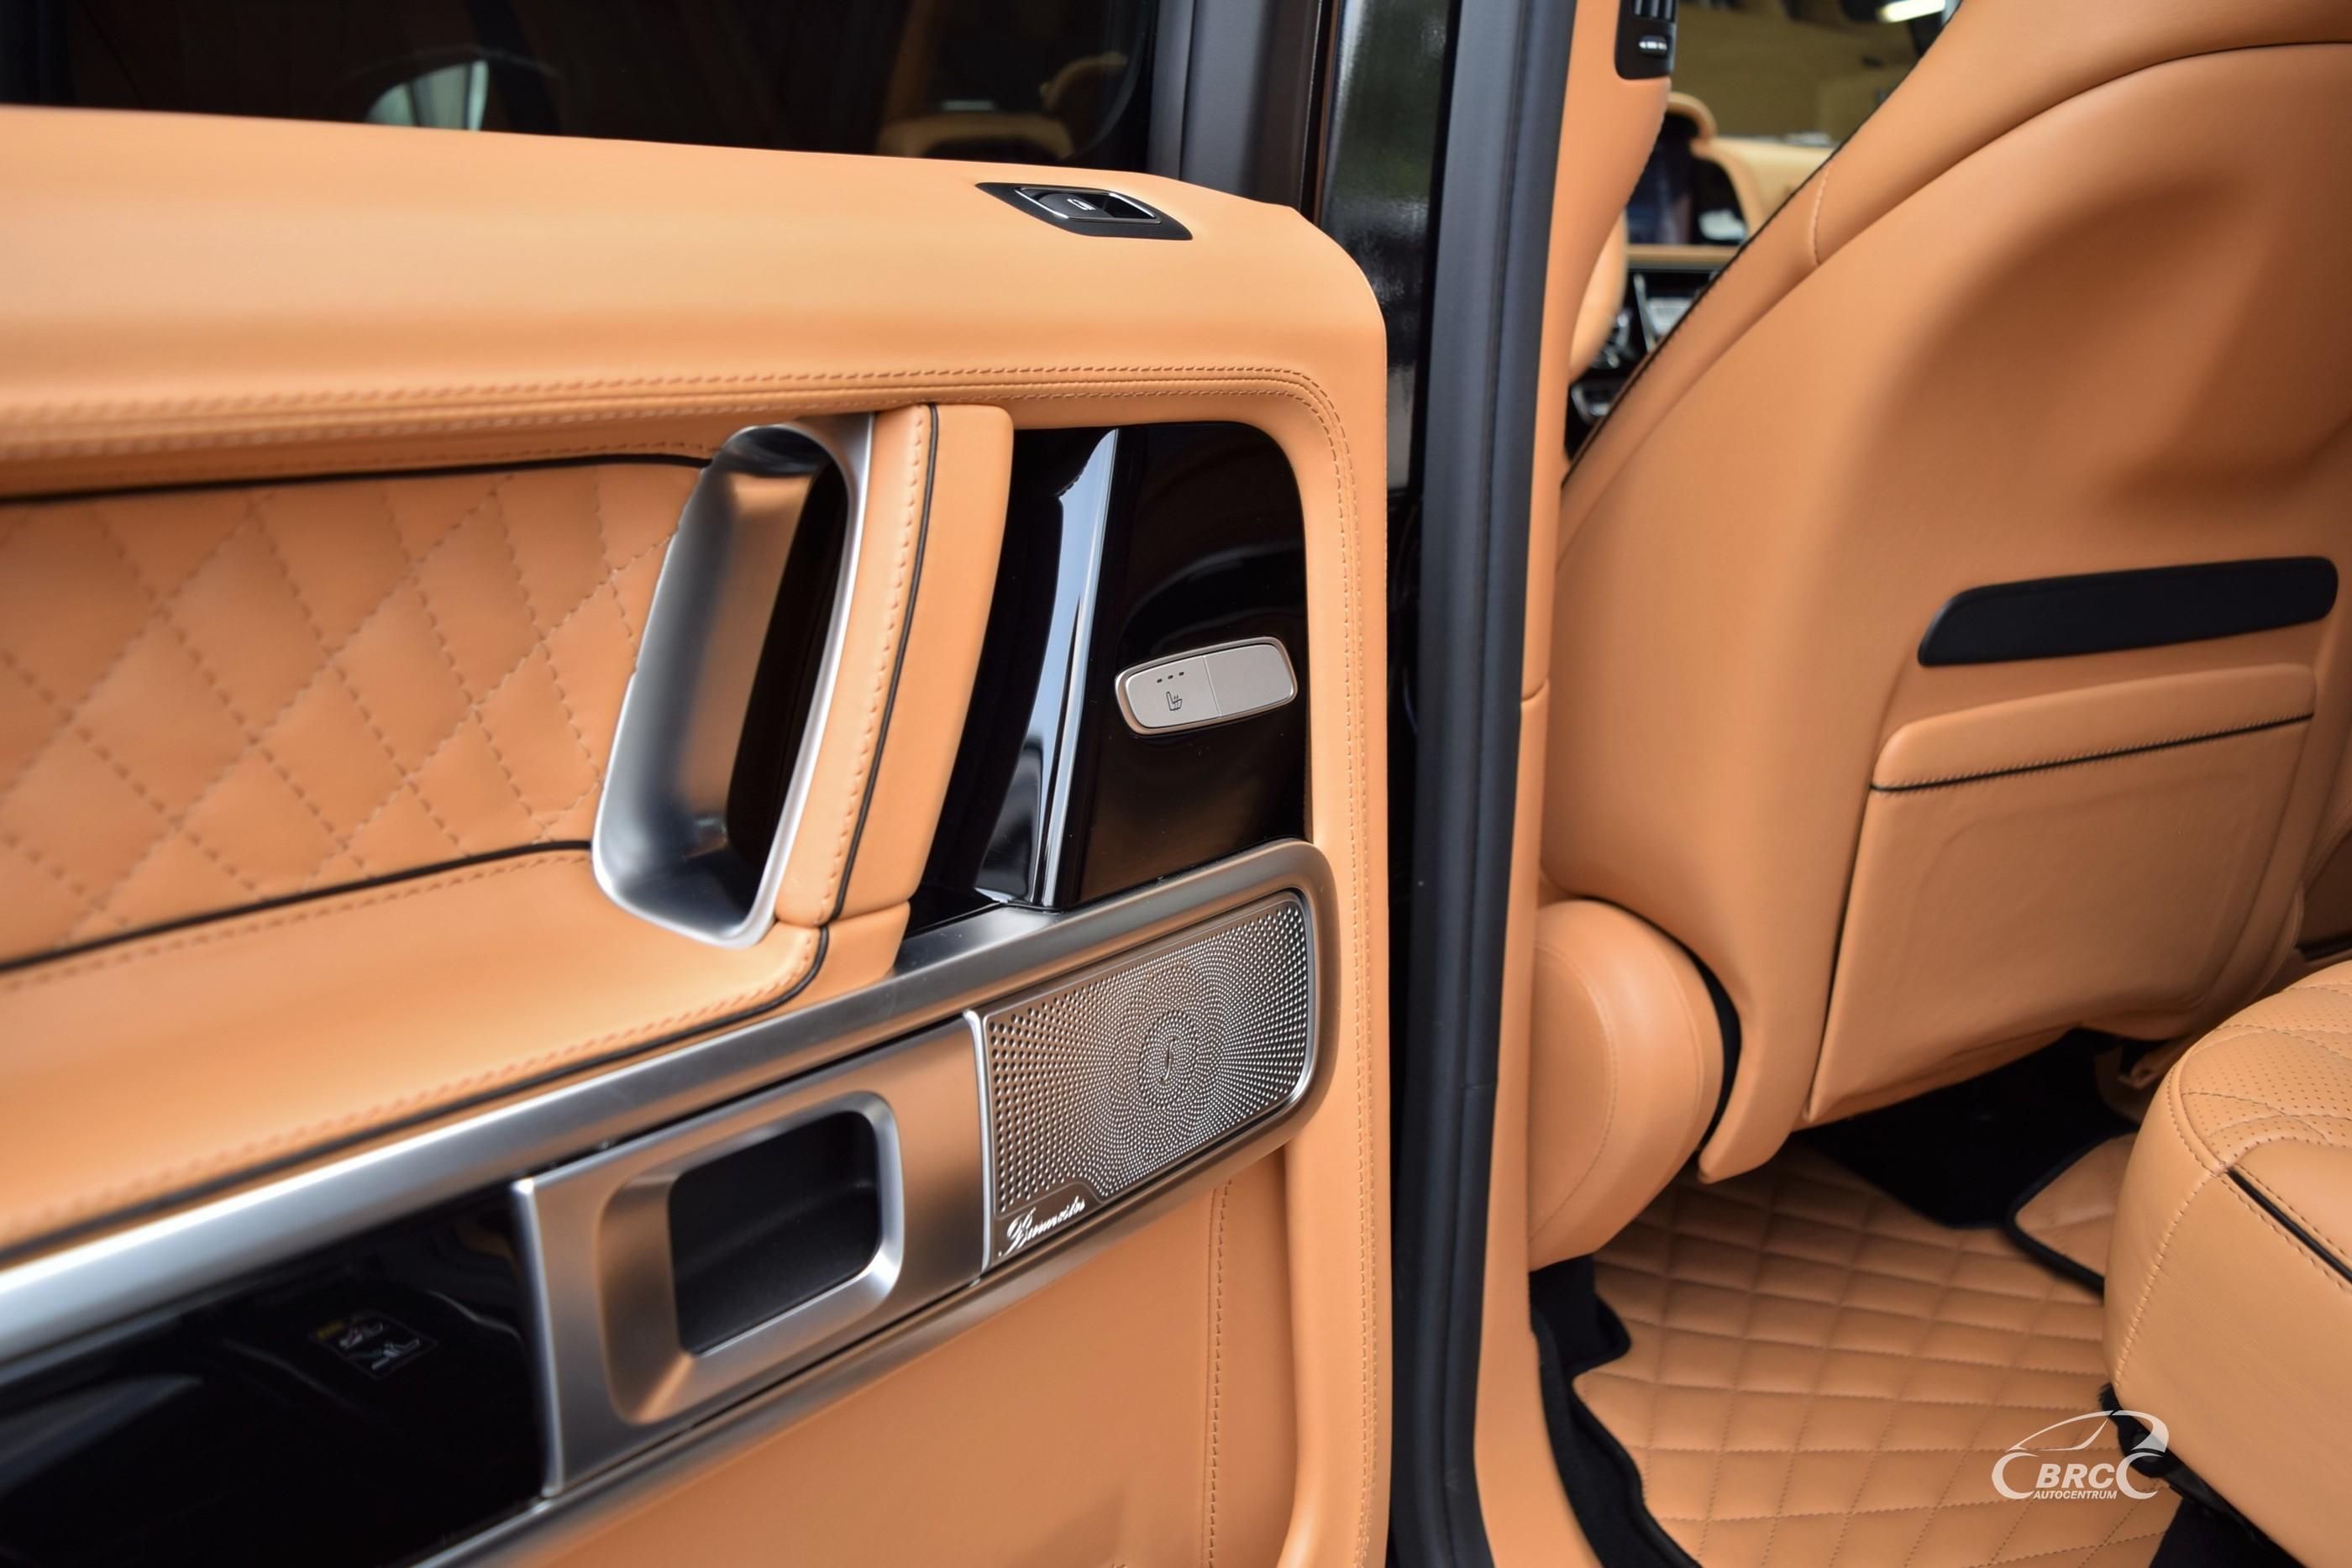 Mercedes-Benz G 63 AMG Brabus BiTurbo